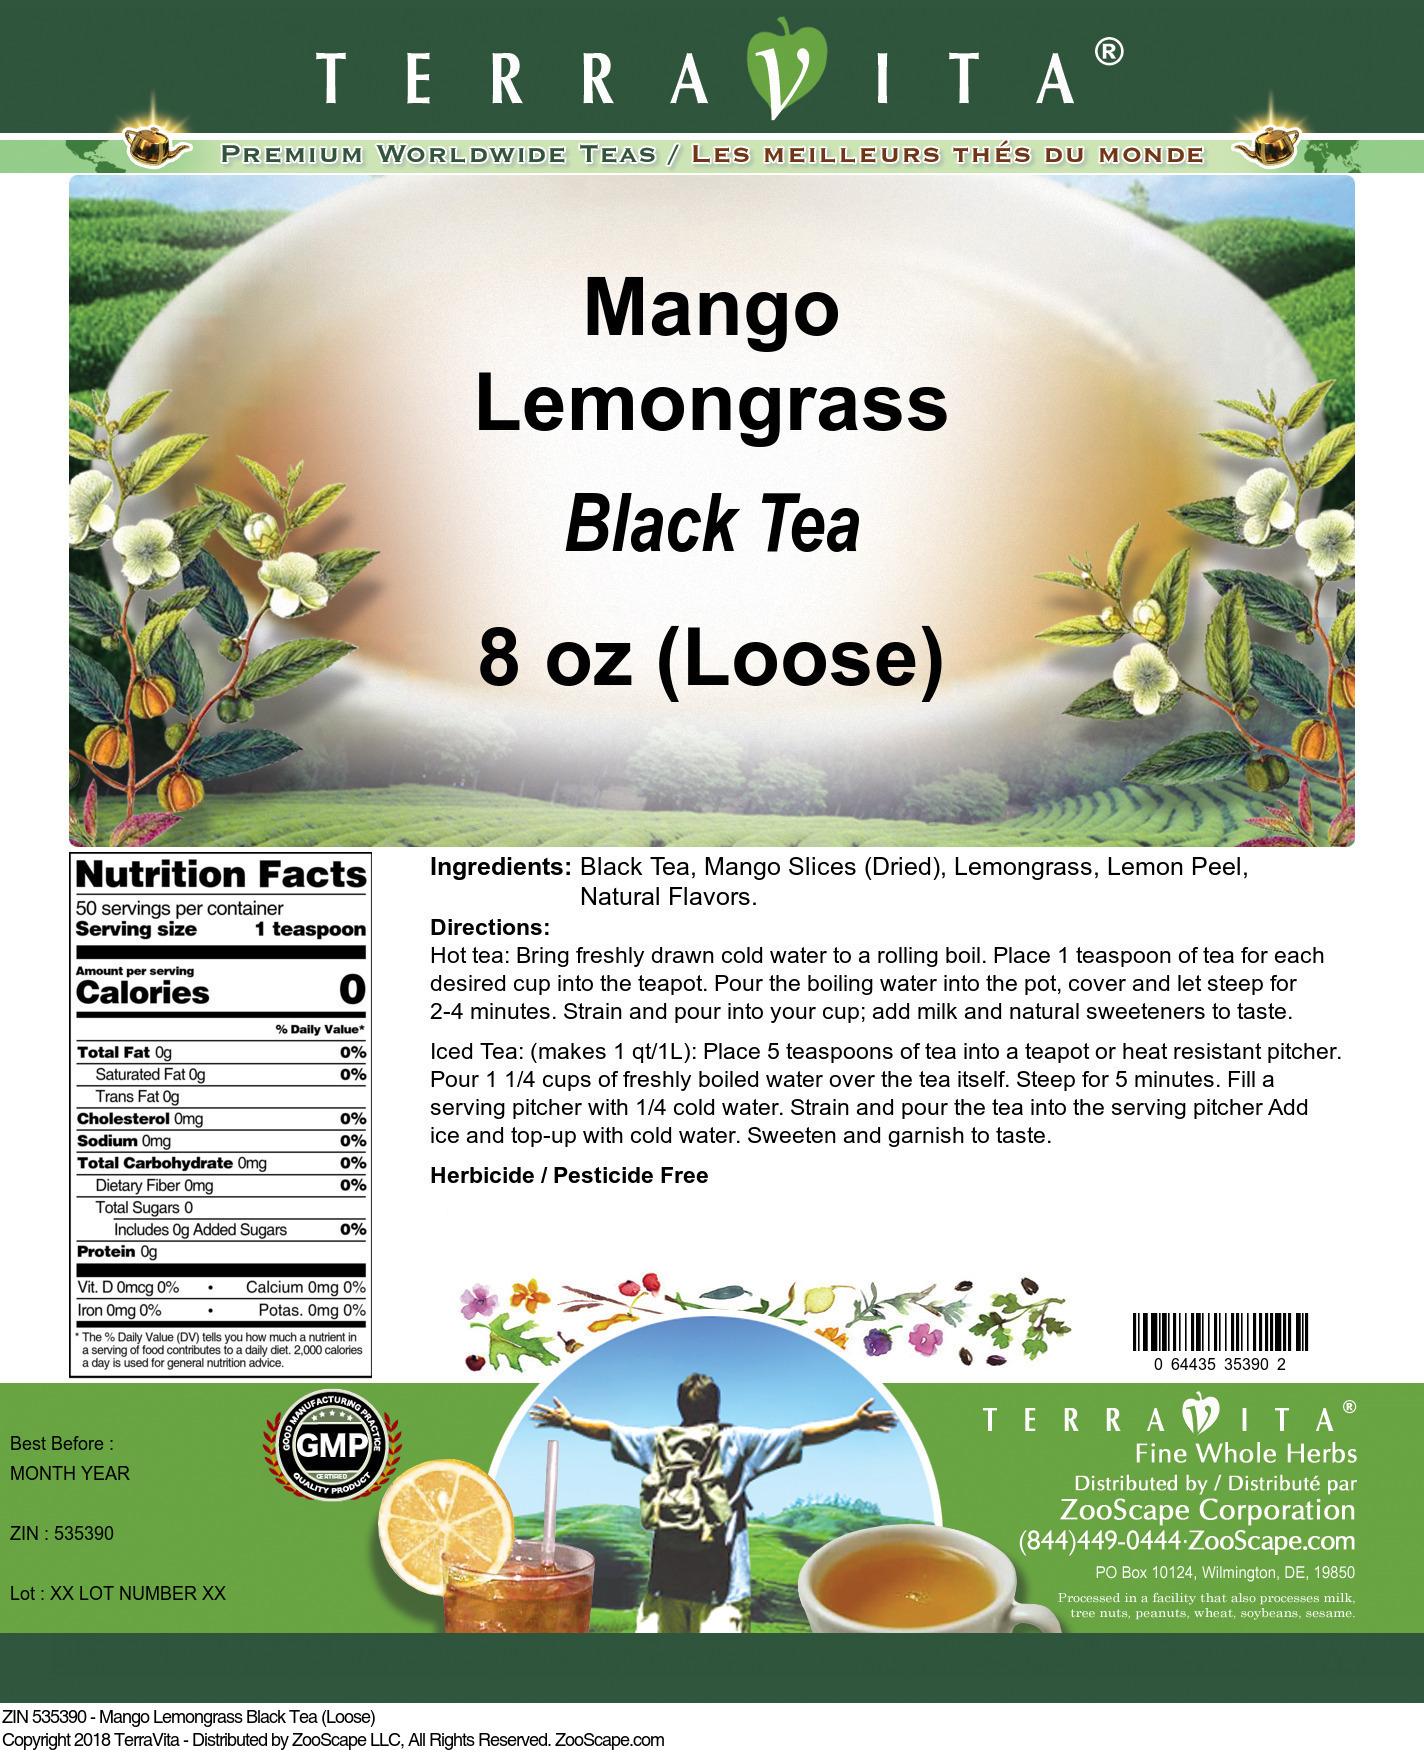 Mango Lemongrass Black Tea